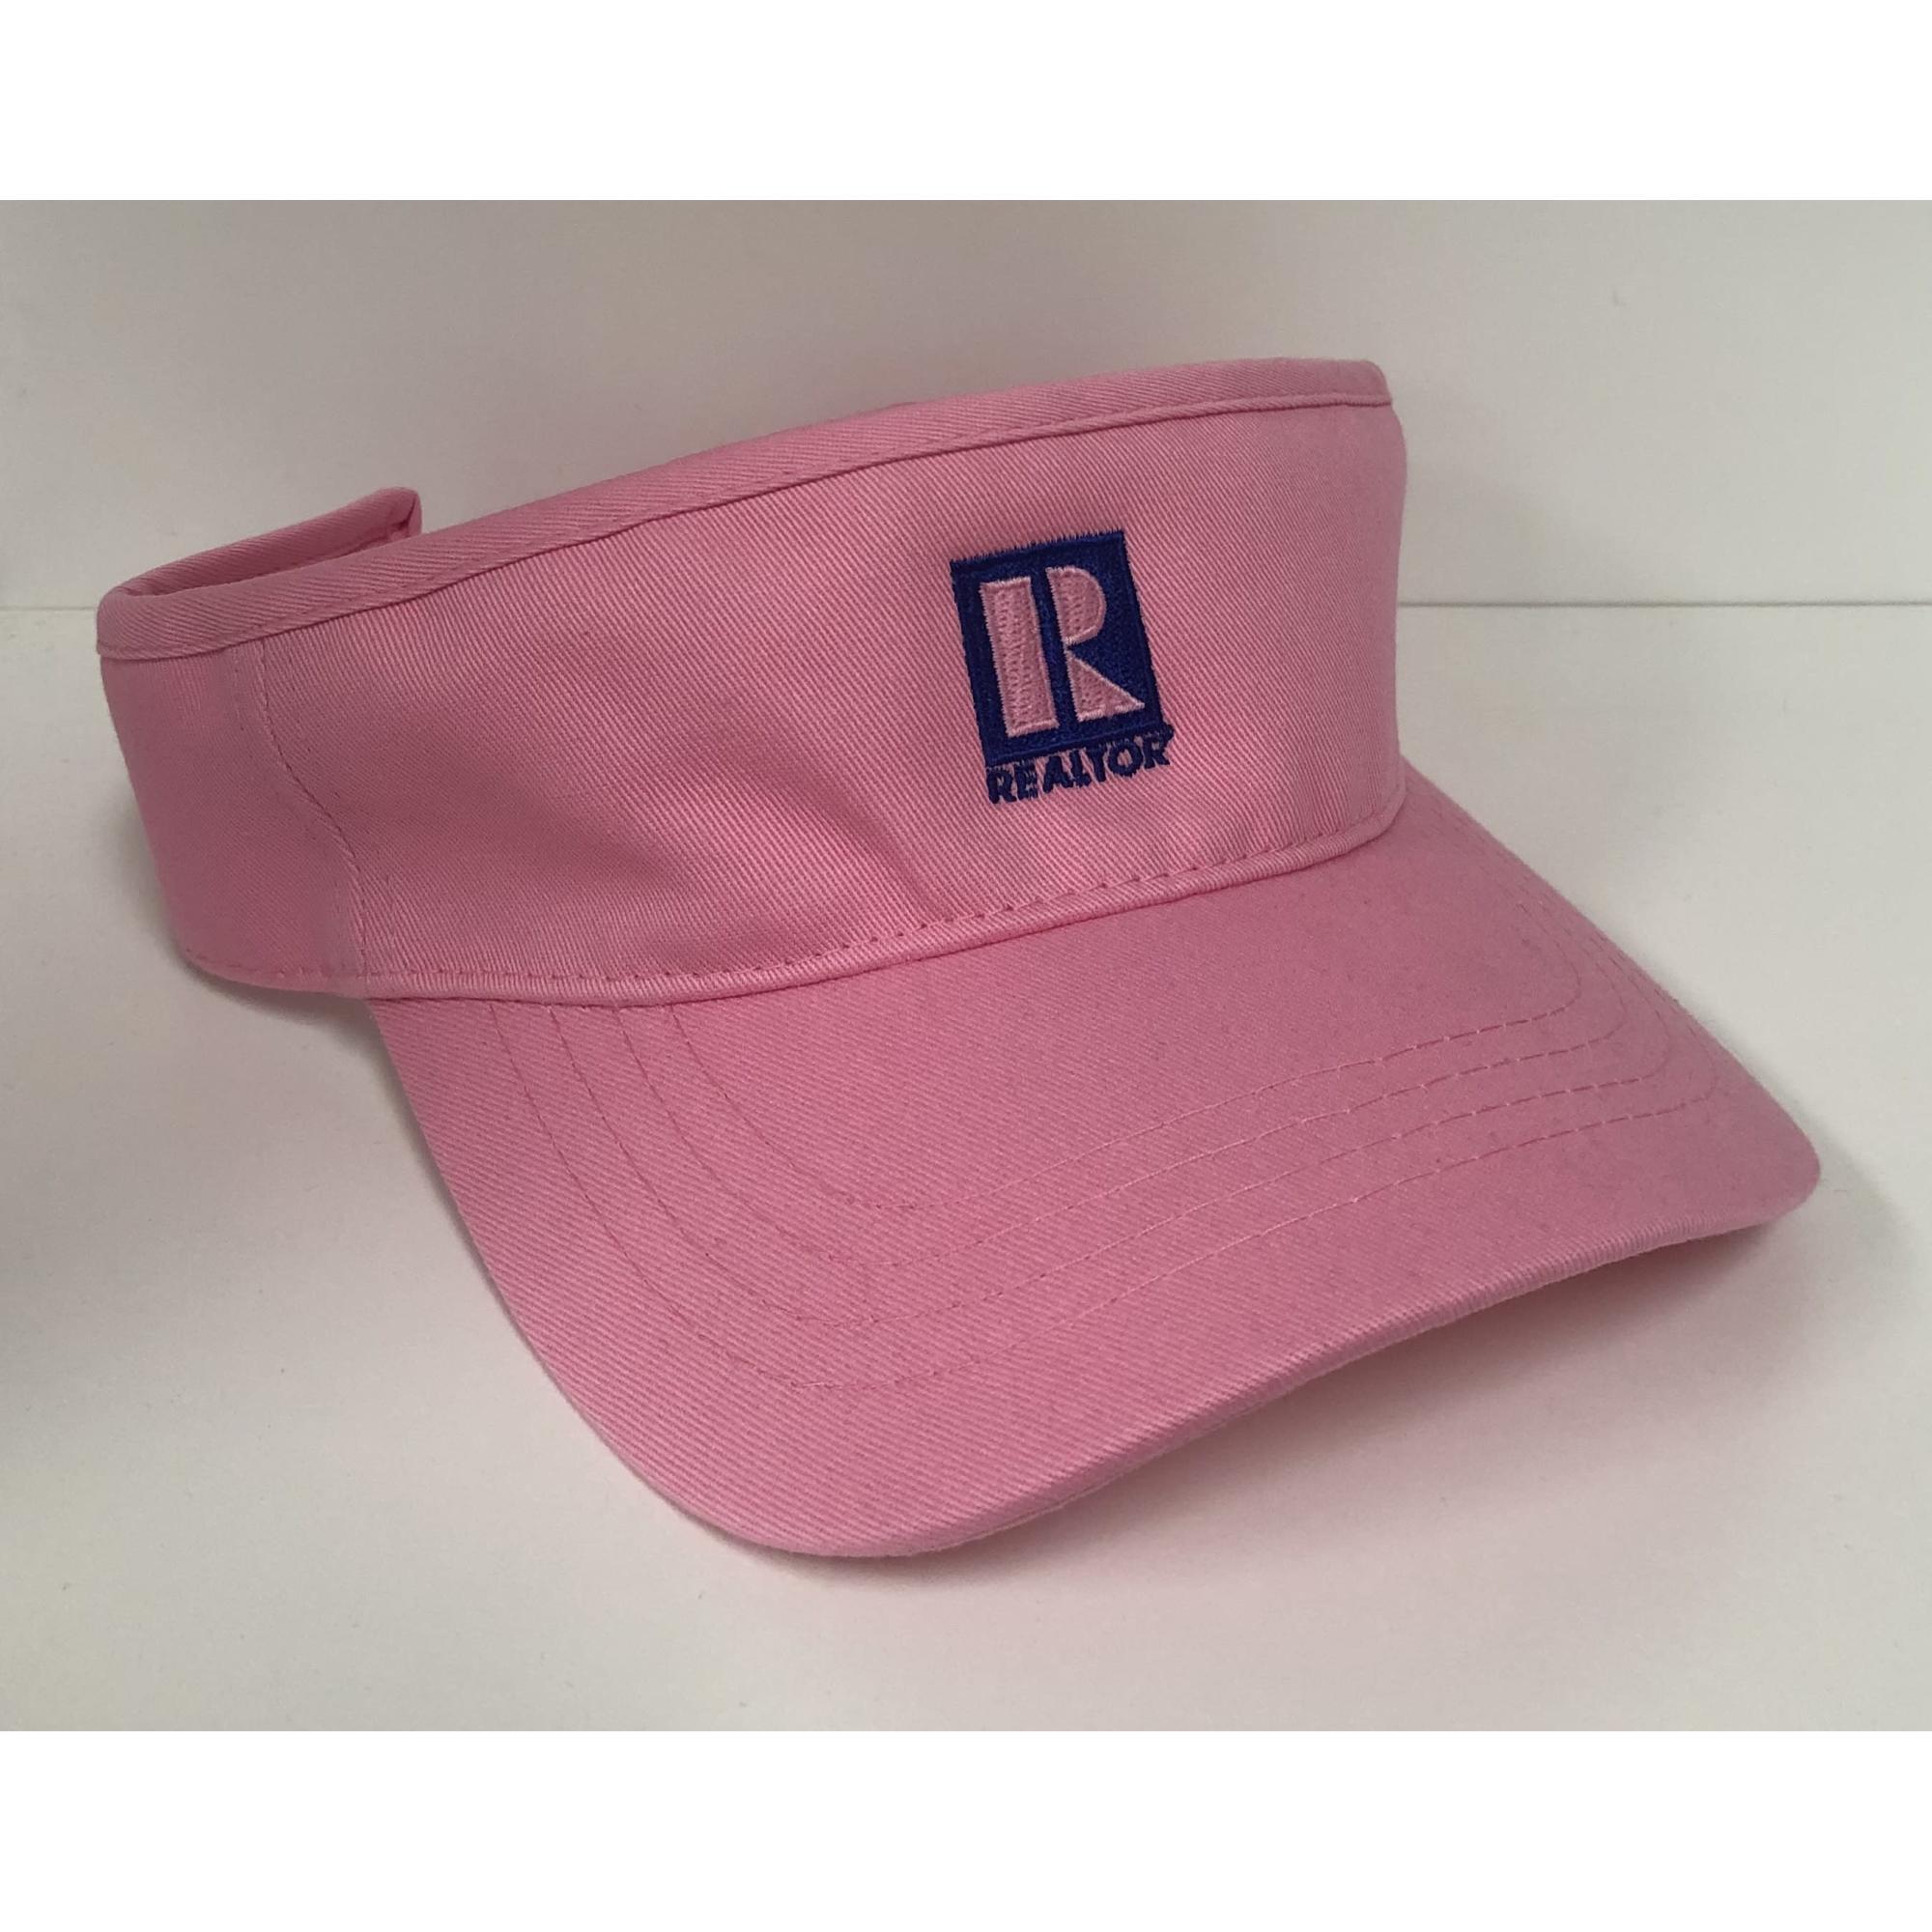 REALTOR® Visor Pink provided by WCREALTORS